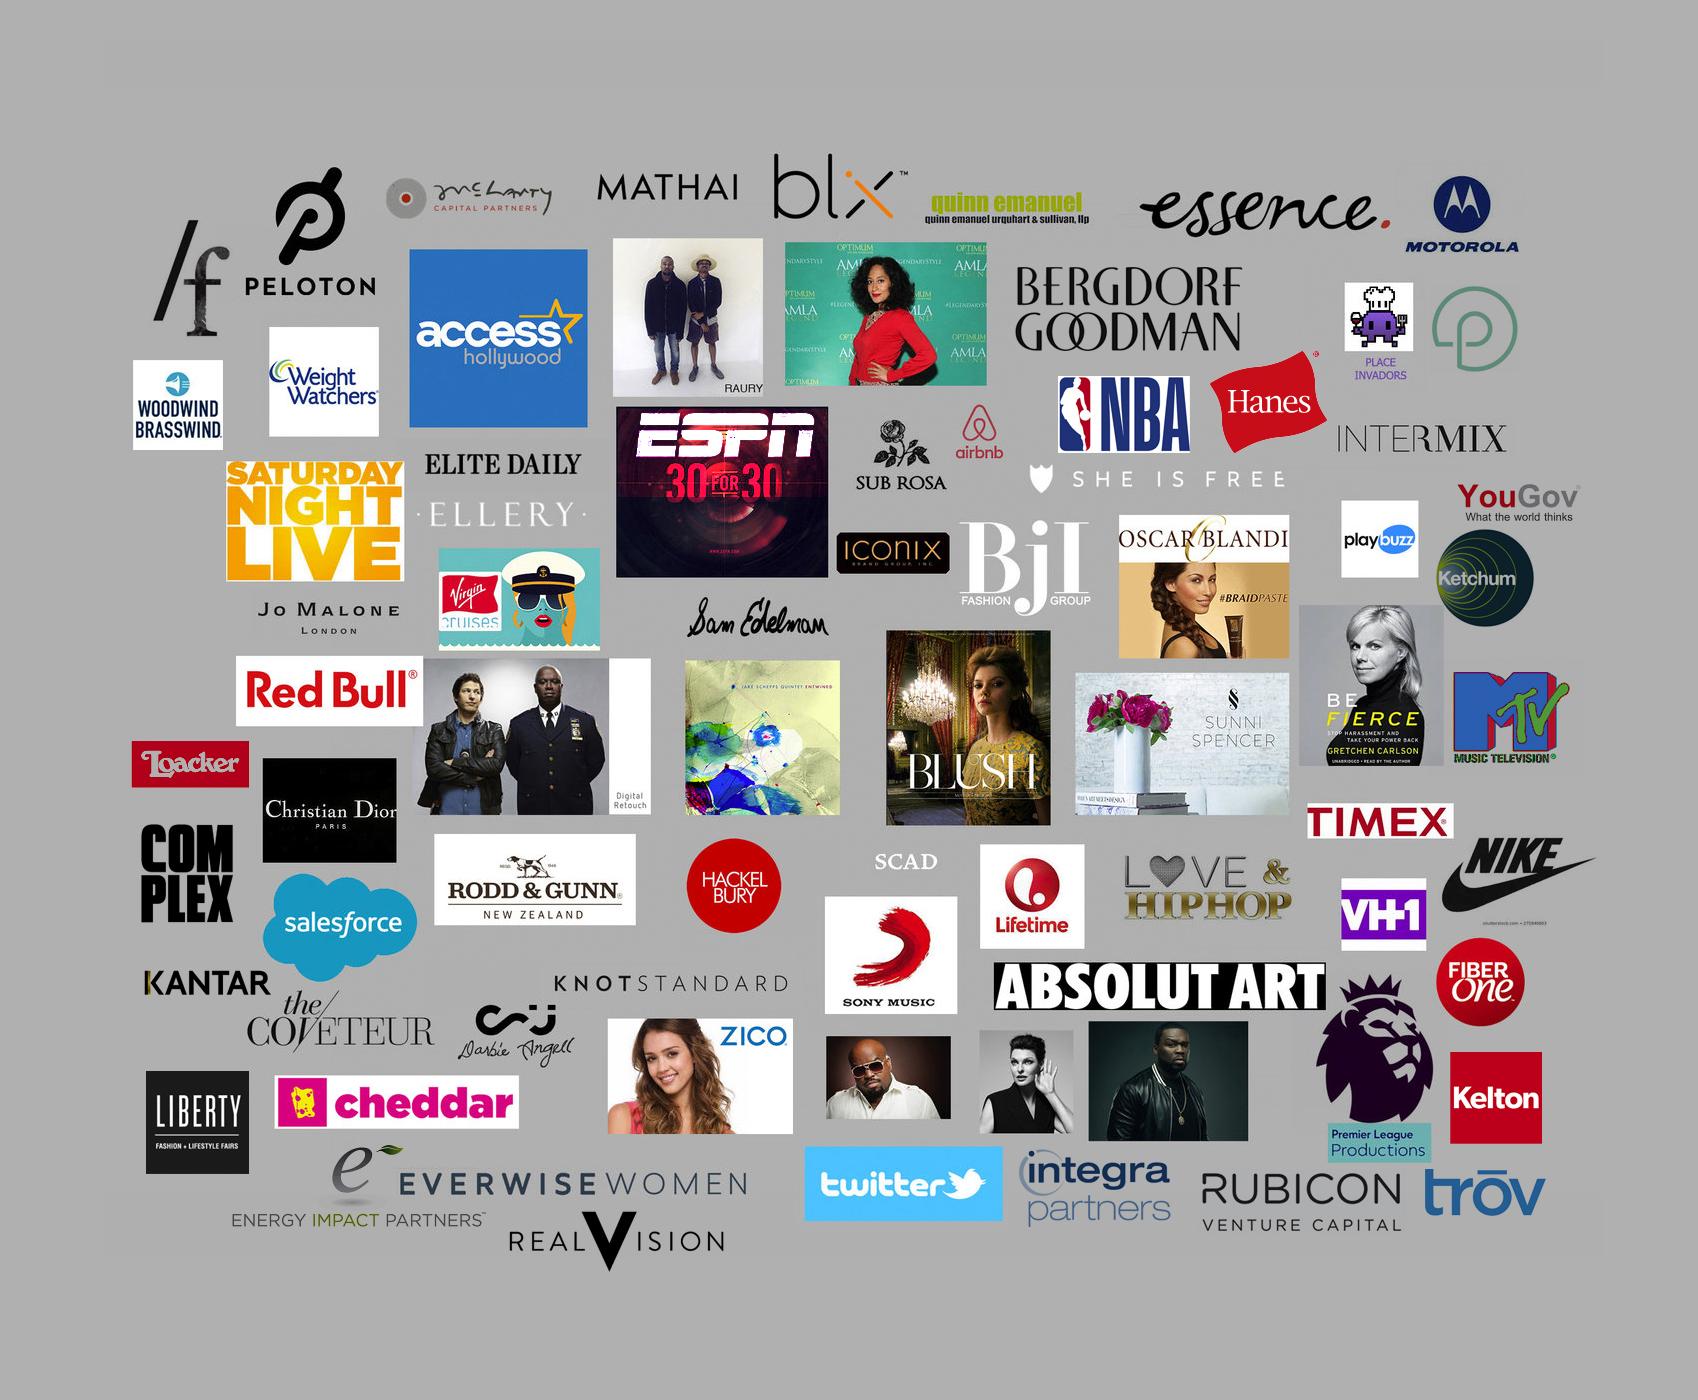 Studio Clients: Christian Dior, Absolute Art, Red Bull, Twitter, SNL, VH1, Virgin, 50Cent, Zico, ESPN, InterMix, Peloton, Sony, Timex, Motorola, Twitter, Access Hollywood...